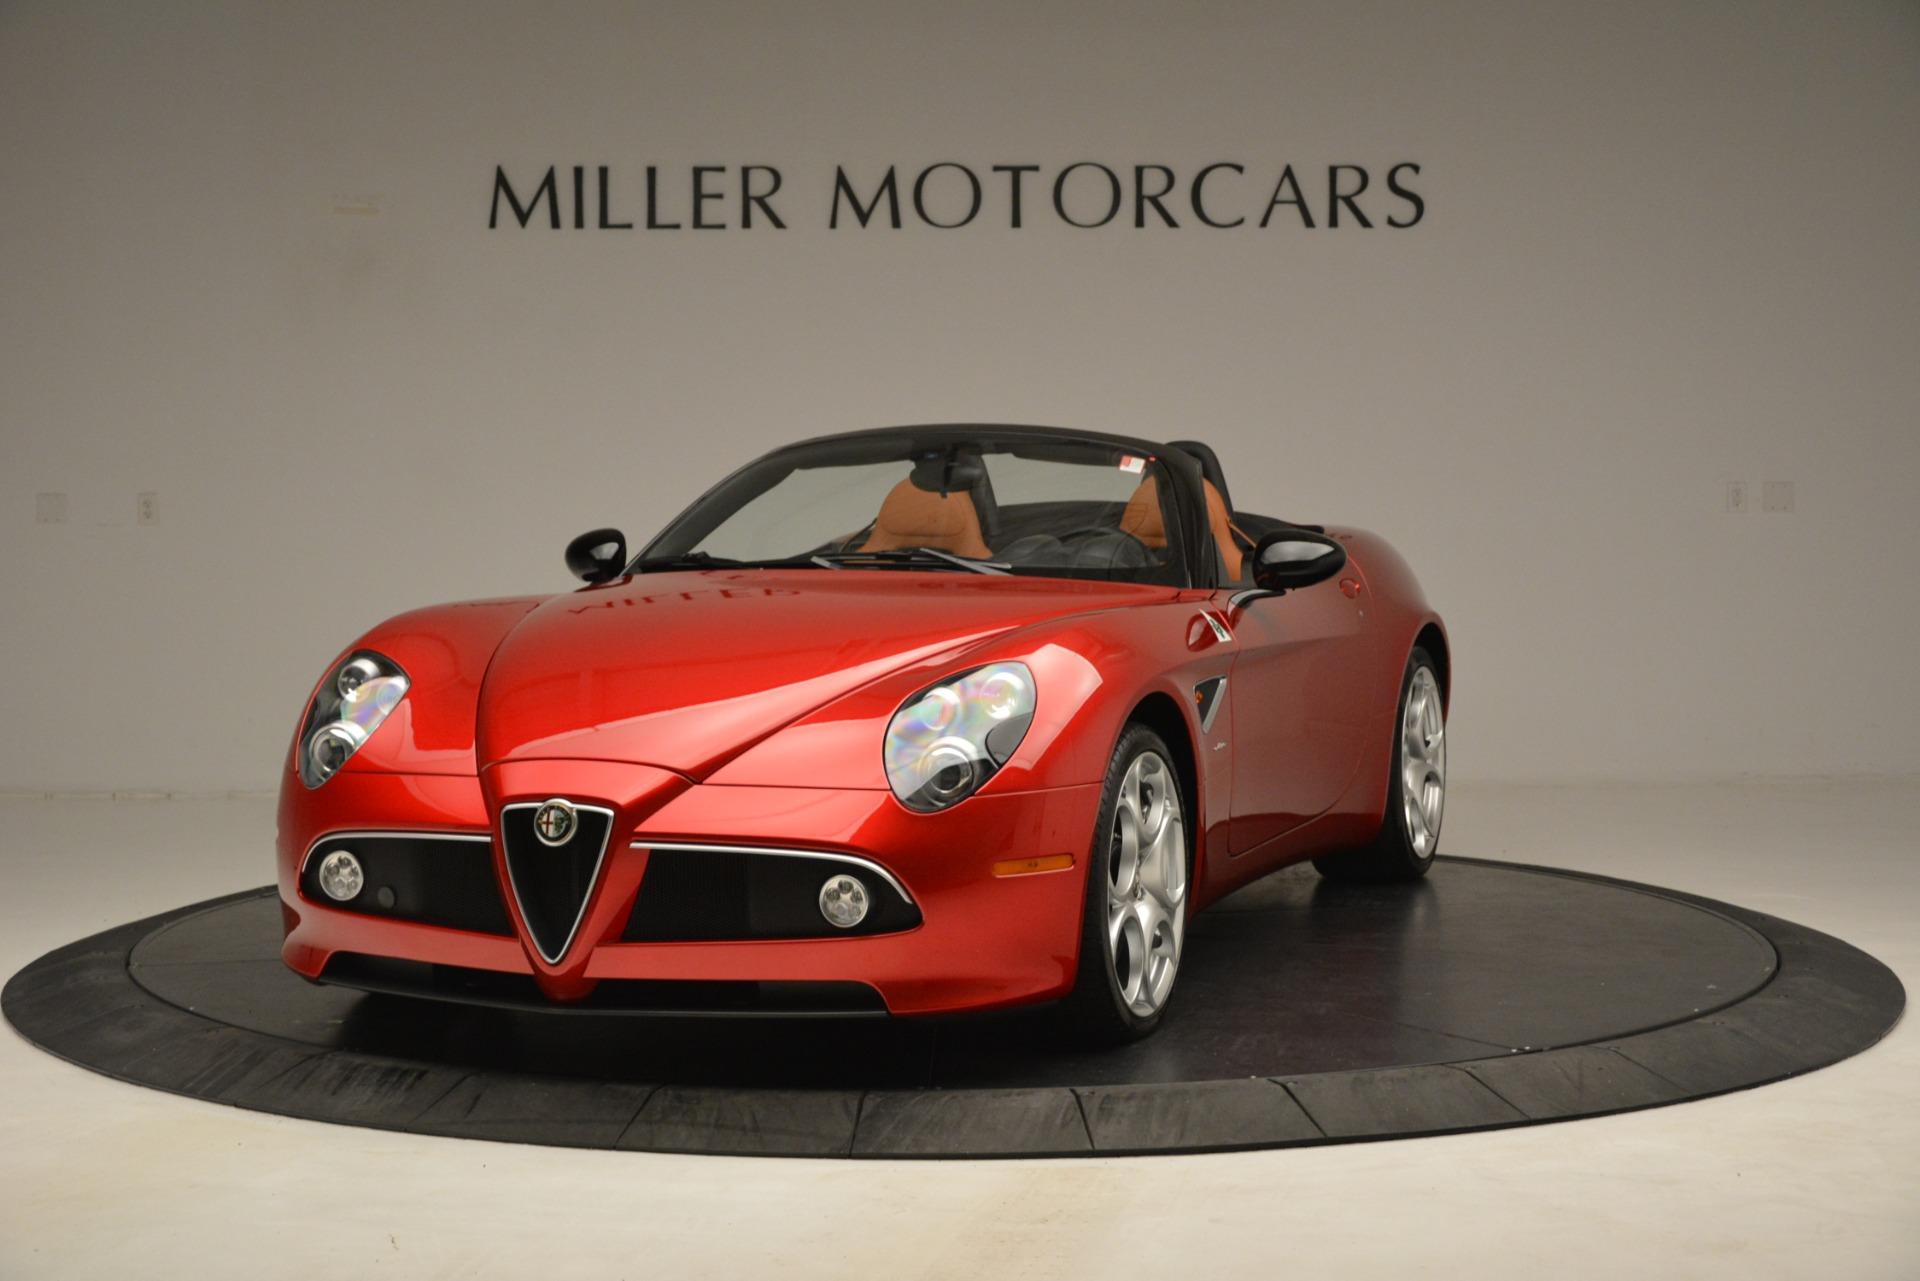 Used 2009 Alfa Romeo 8c Spider for sale Sold at Alfa Romeo of Westport in Westport CT 06880 1